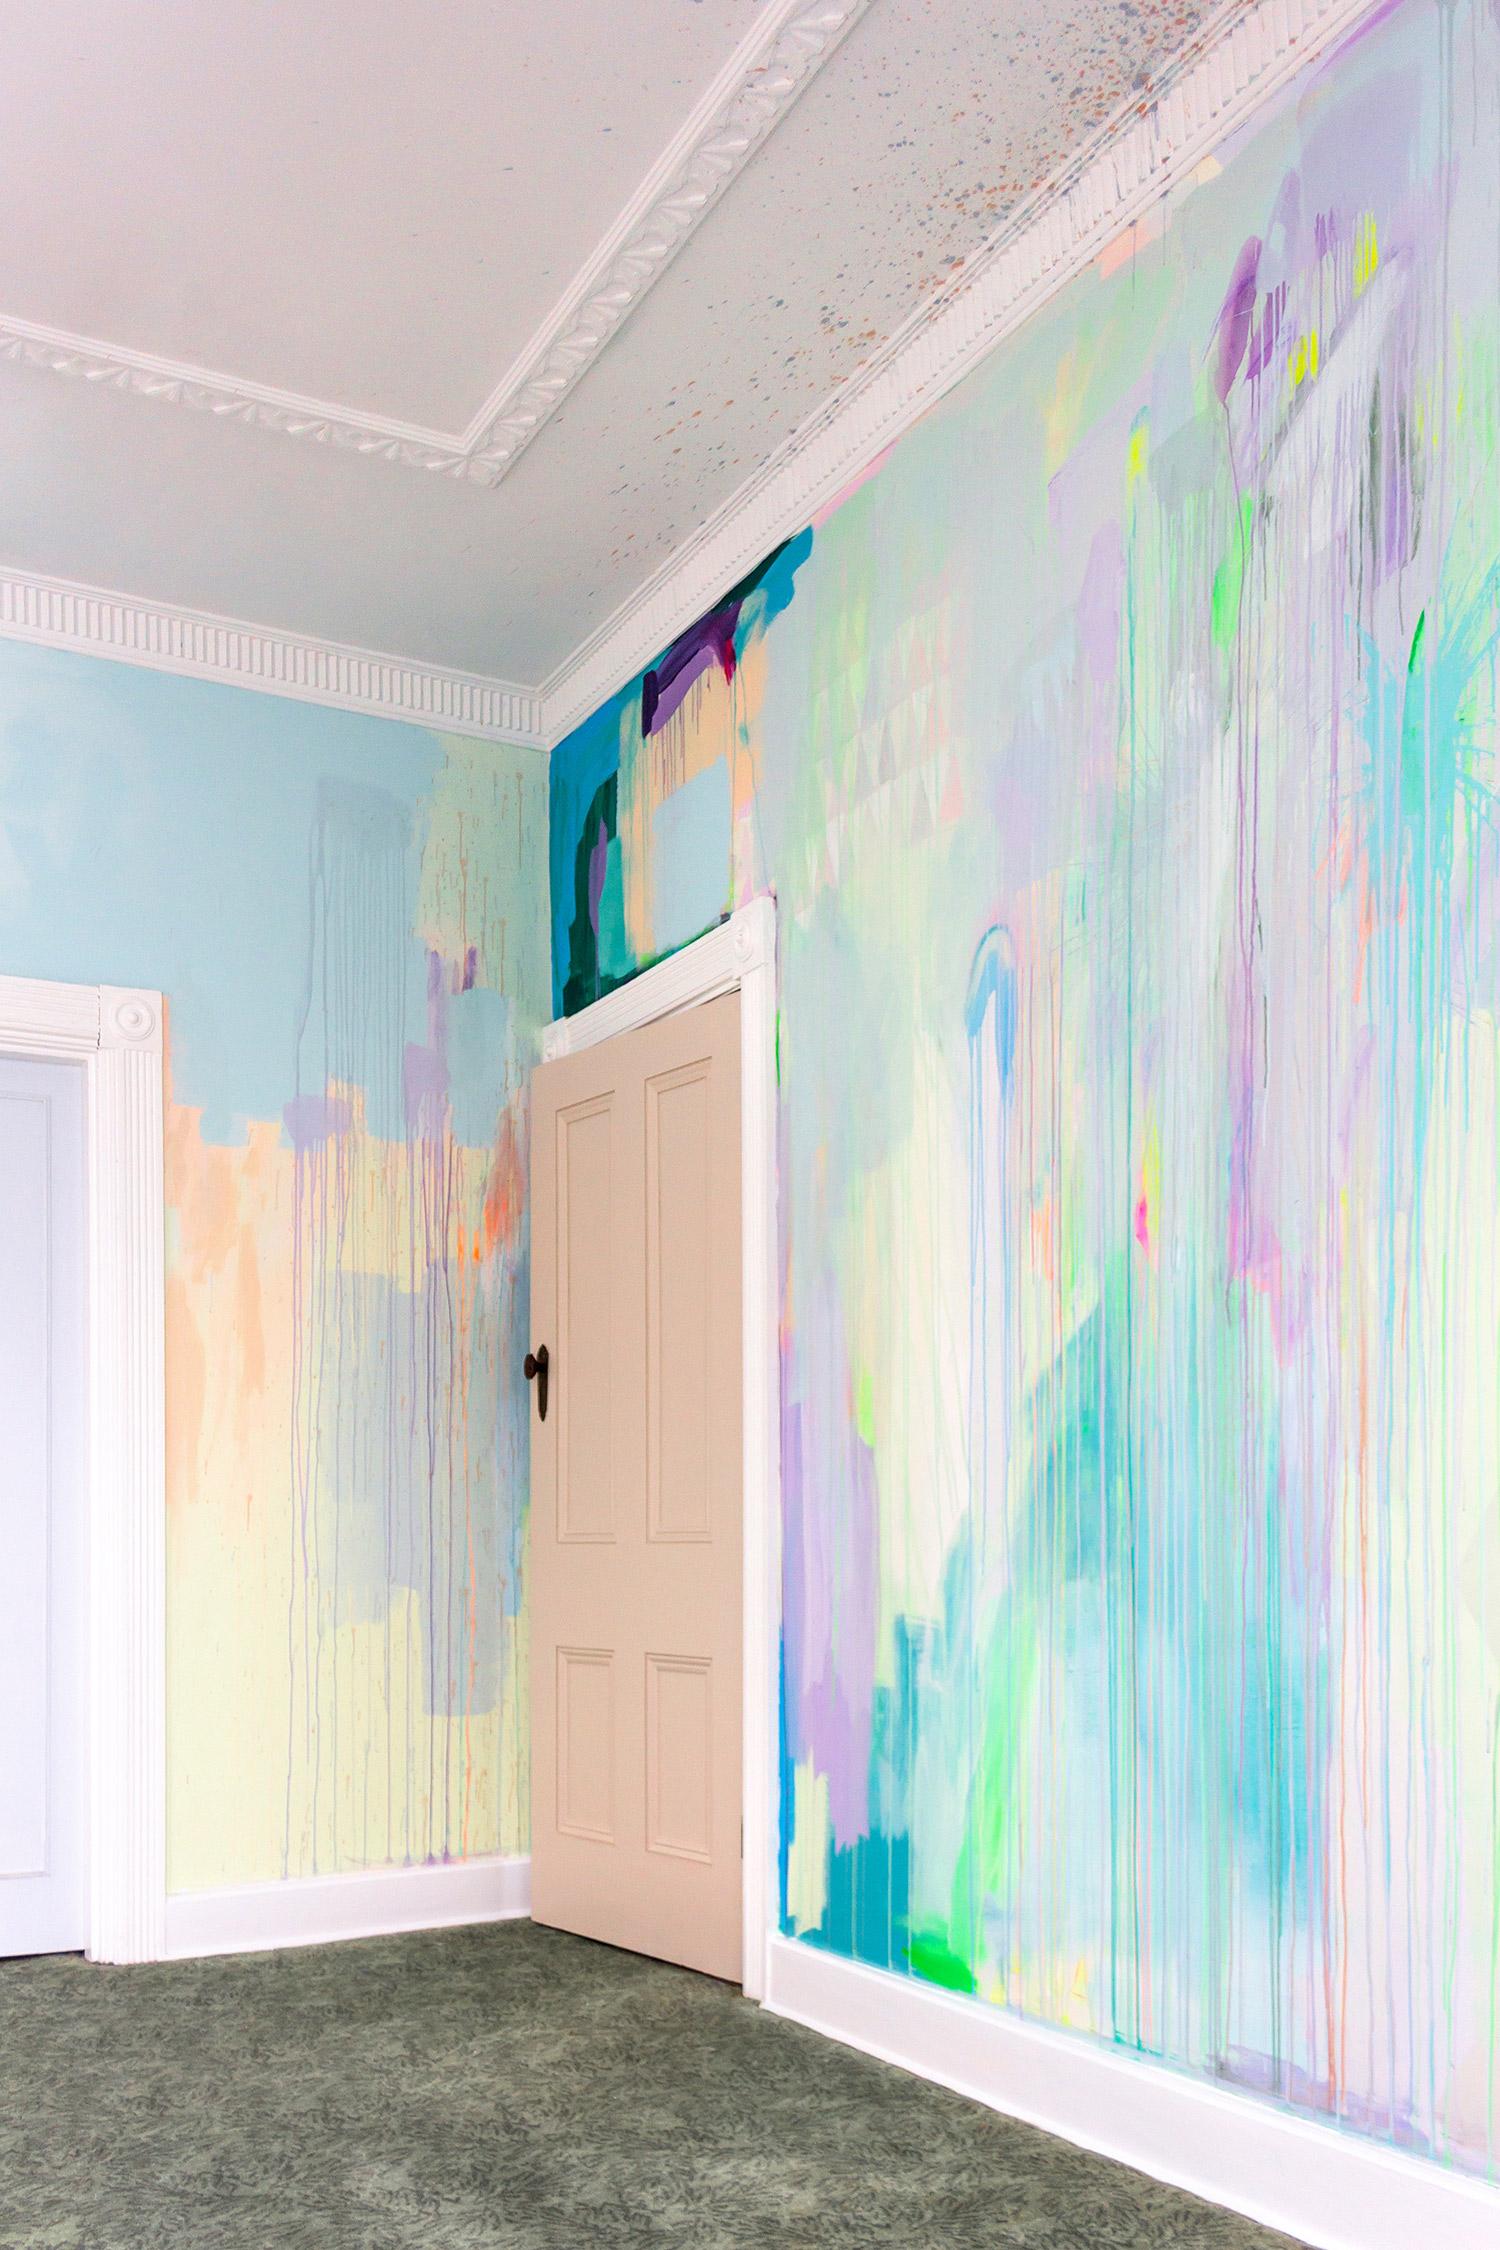 mural-pastel-magical-child-camillejaval-12.jpg